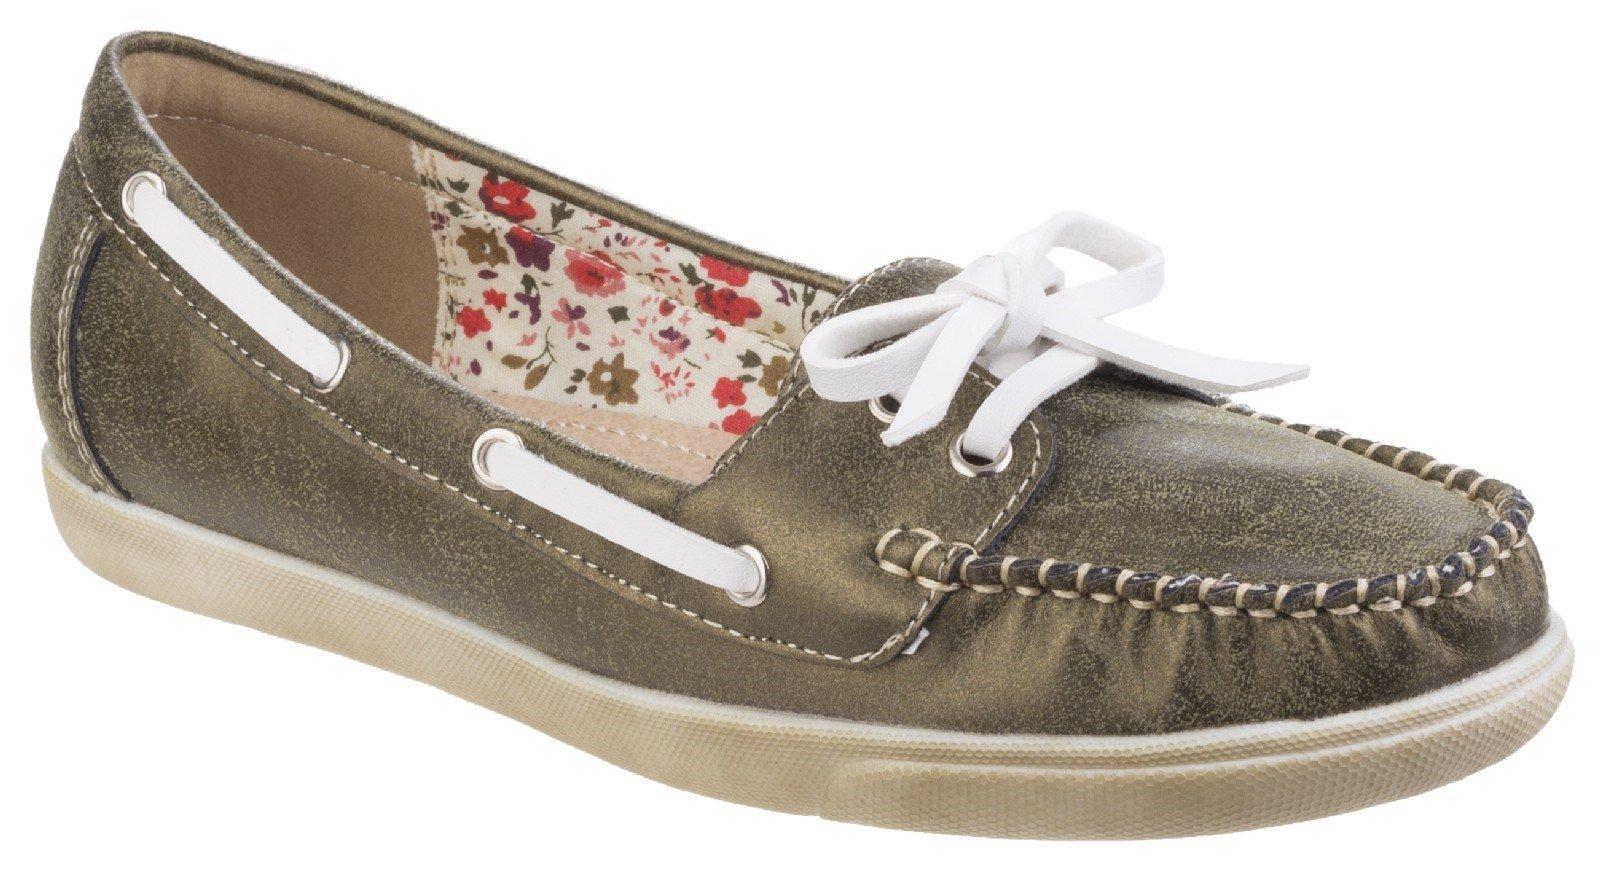 Fleet & Foster Women's Melbeck Ladies Boat Shoe Grey 24944-41270 - Green 4